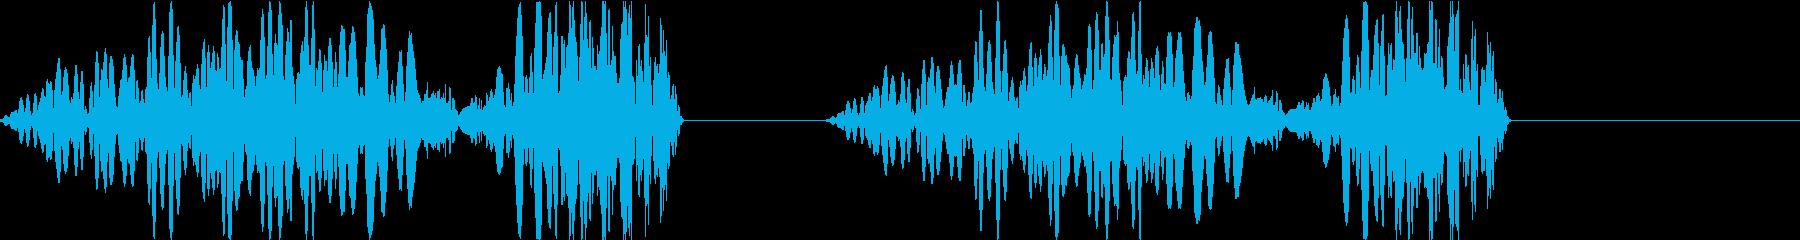 DJプレイ スクラッチ・ノイズ 250の再生済みの波形